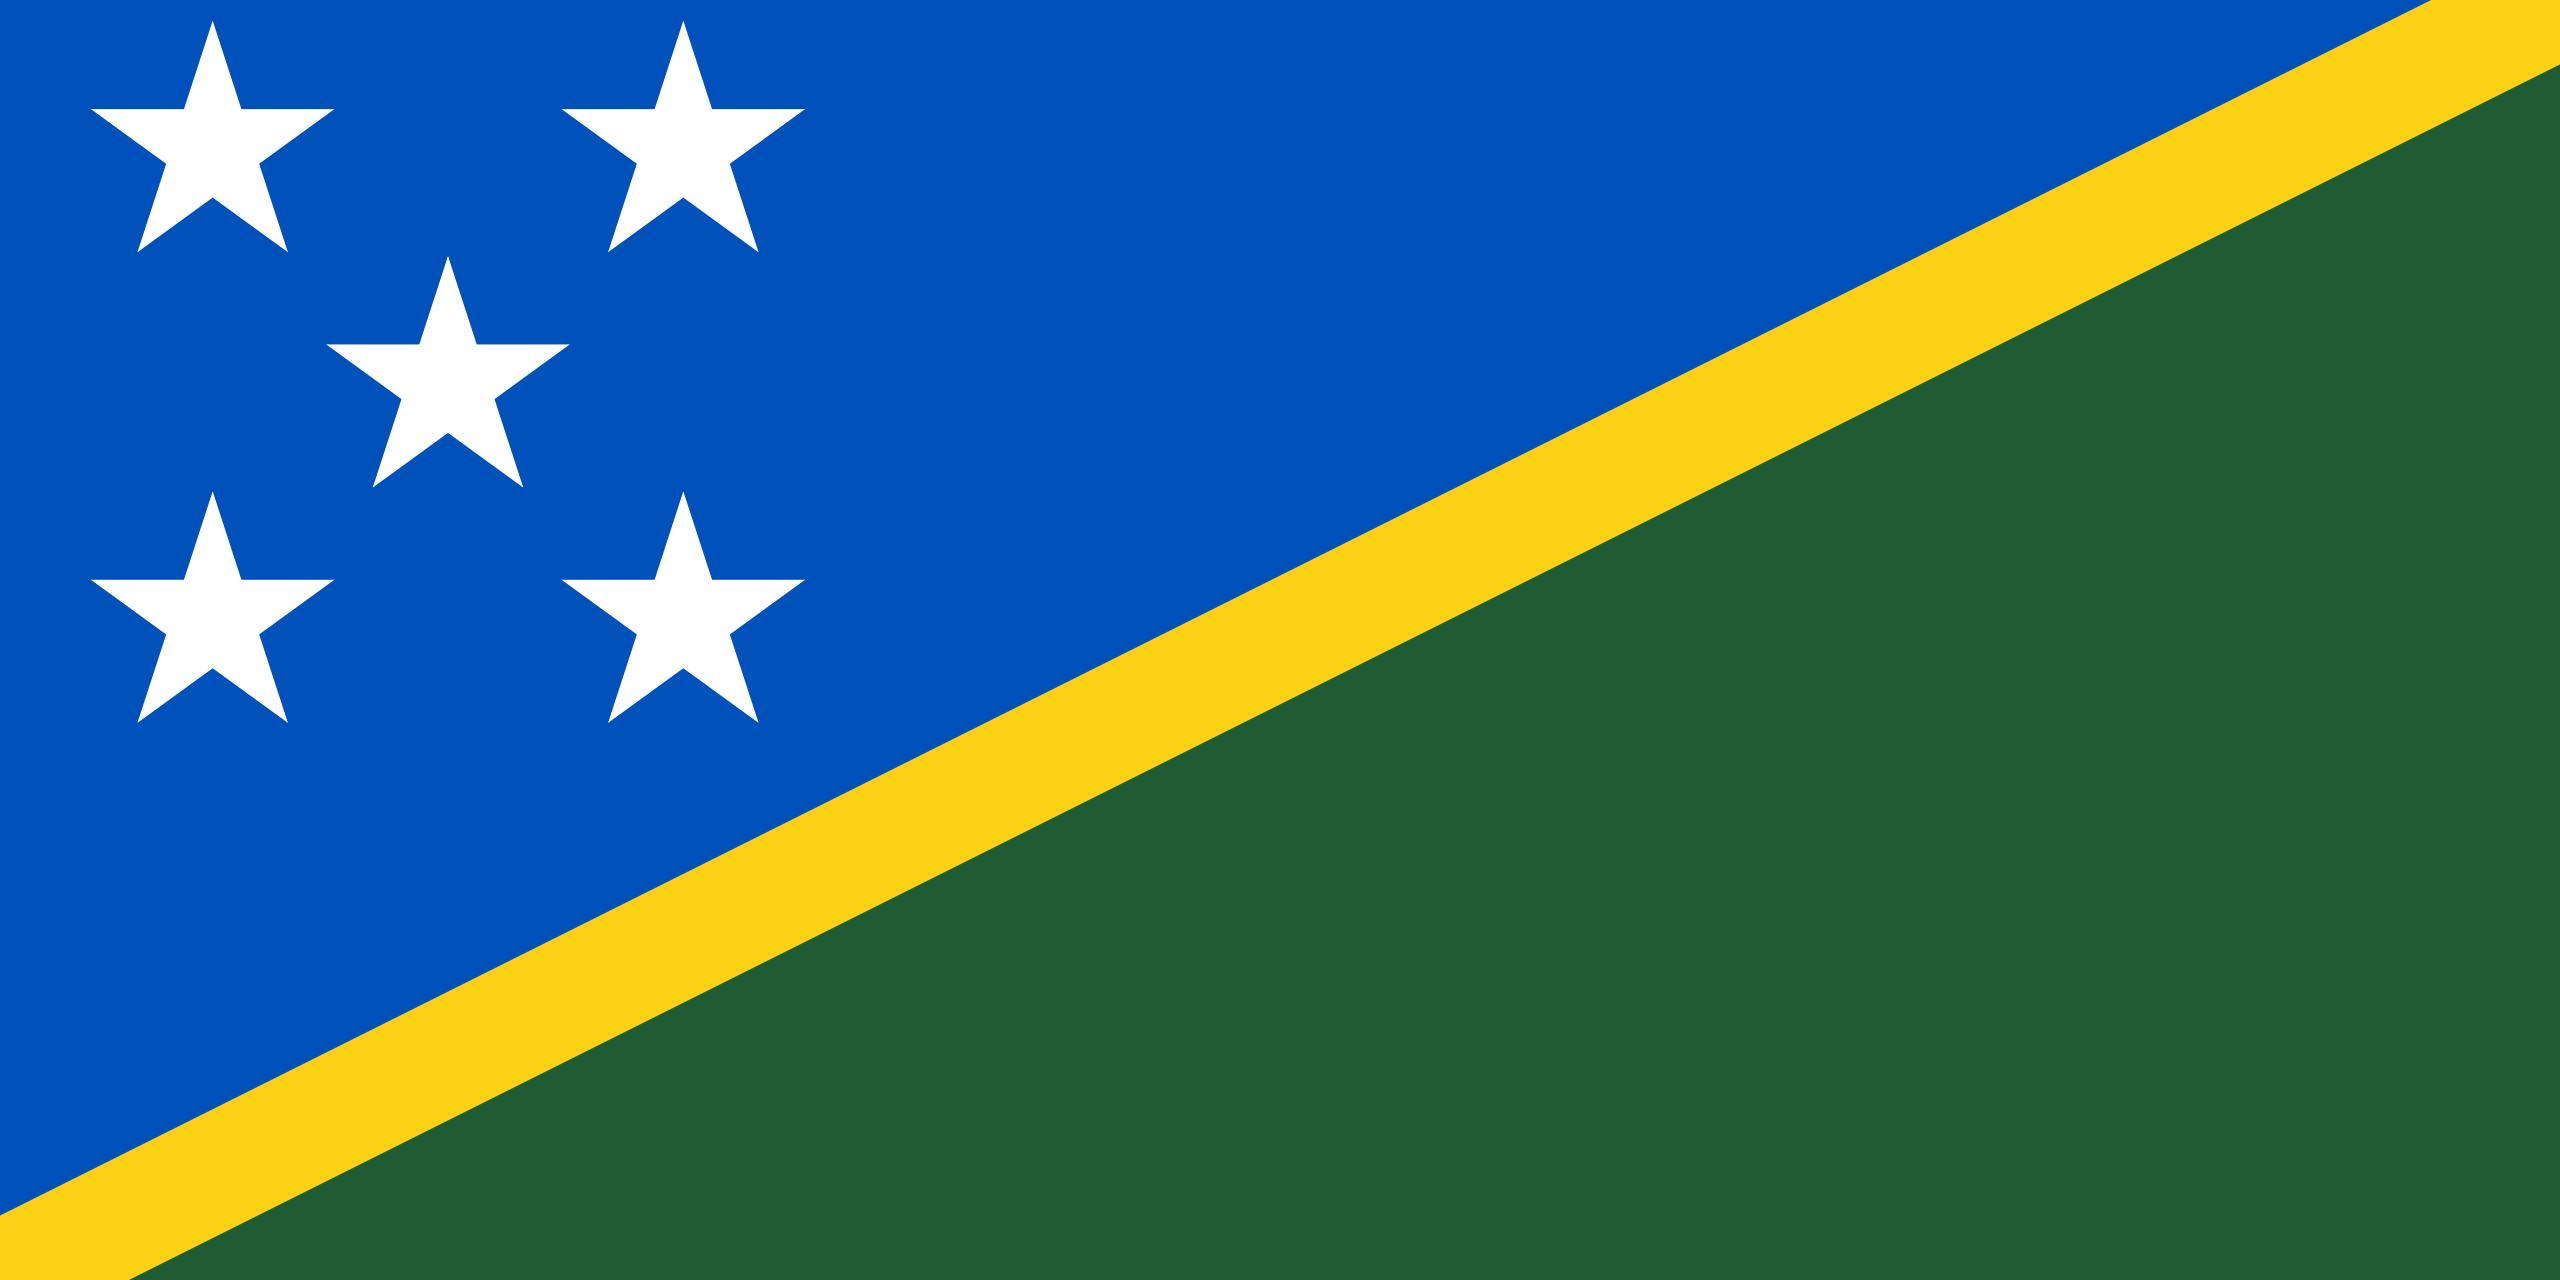 islas salomón, Land, Emblem, Logo, Symbol - Wallpaper HD - Prof.-falken.com